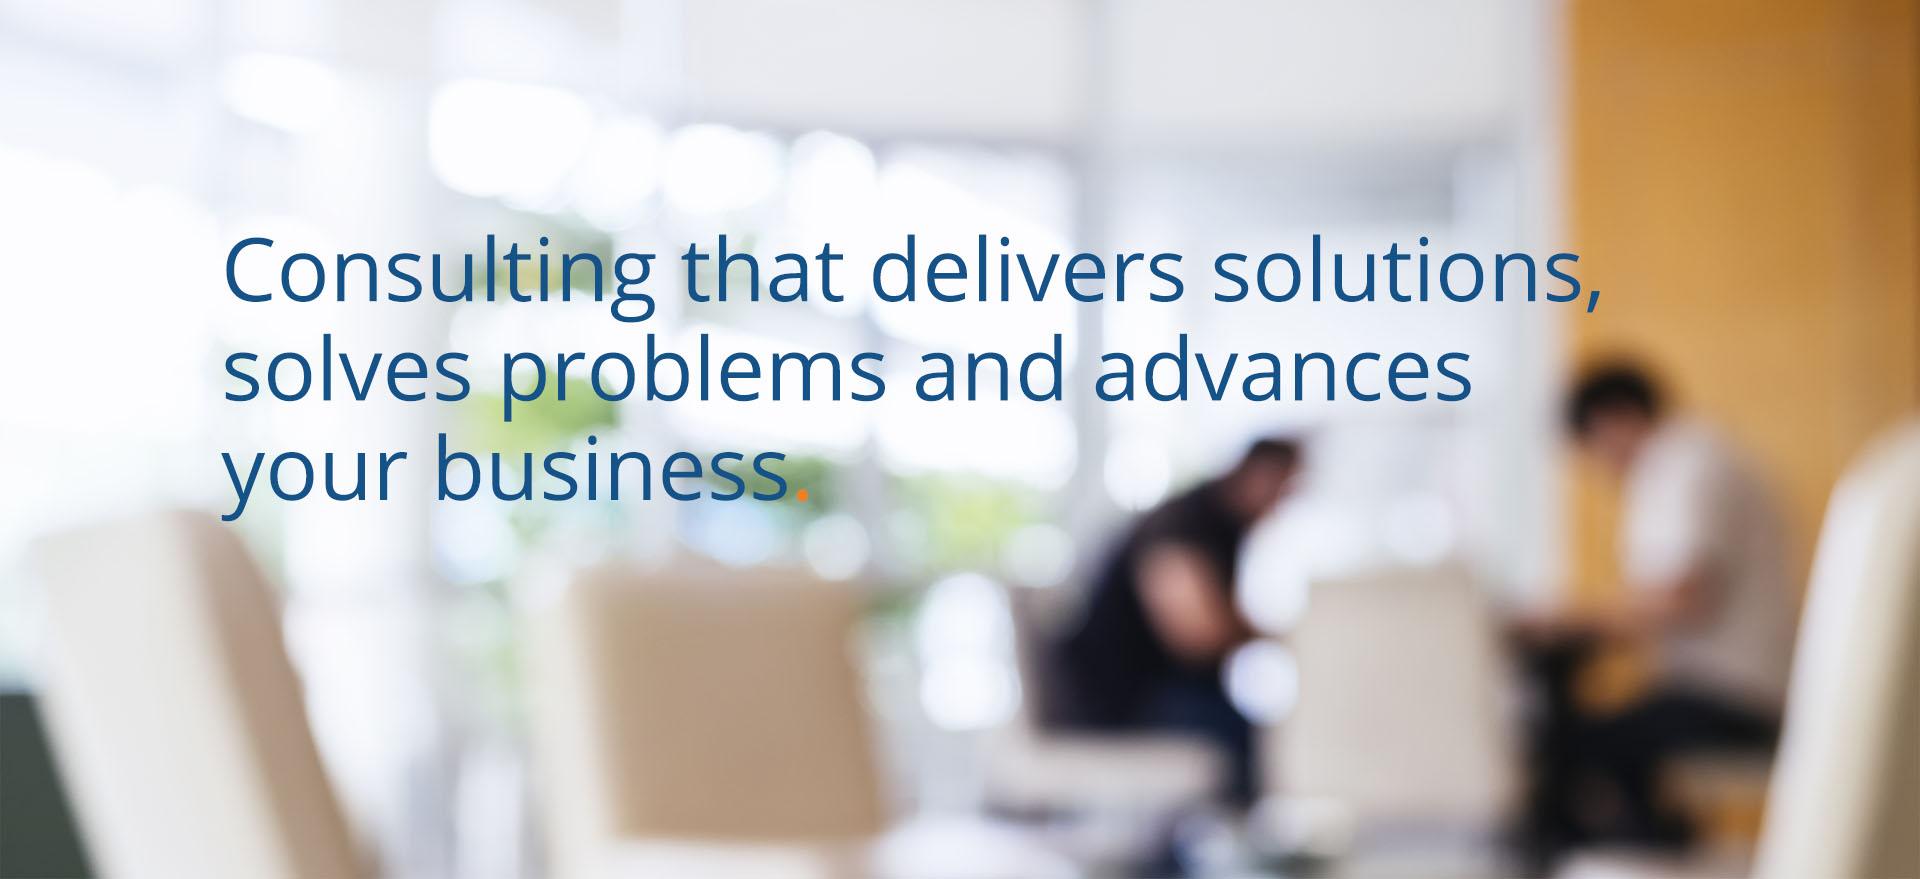 KiZAN solves complex business problems